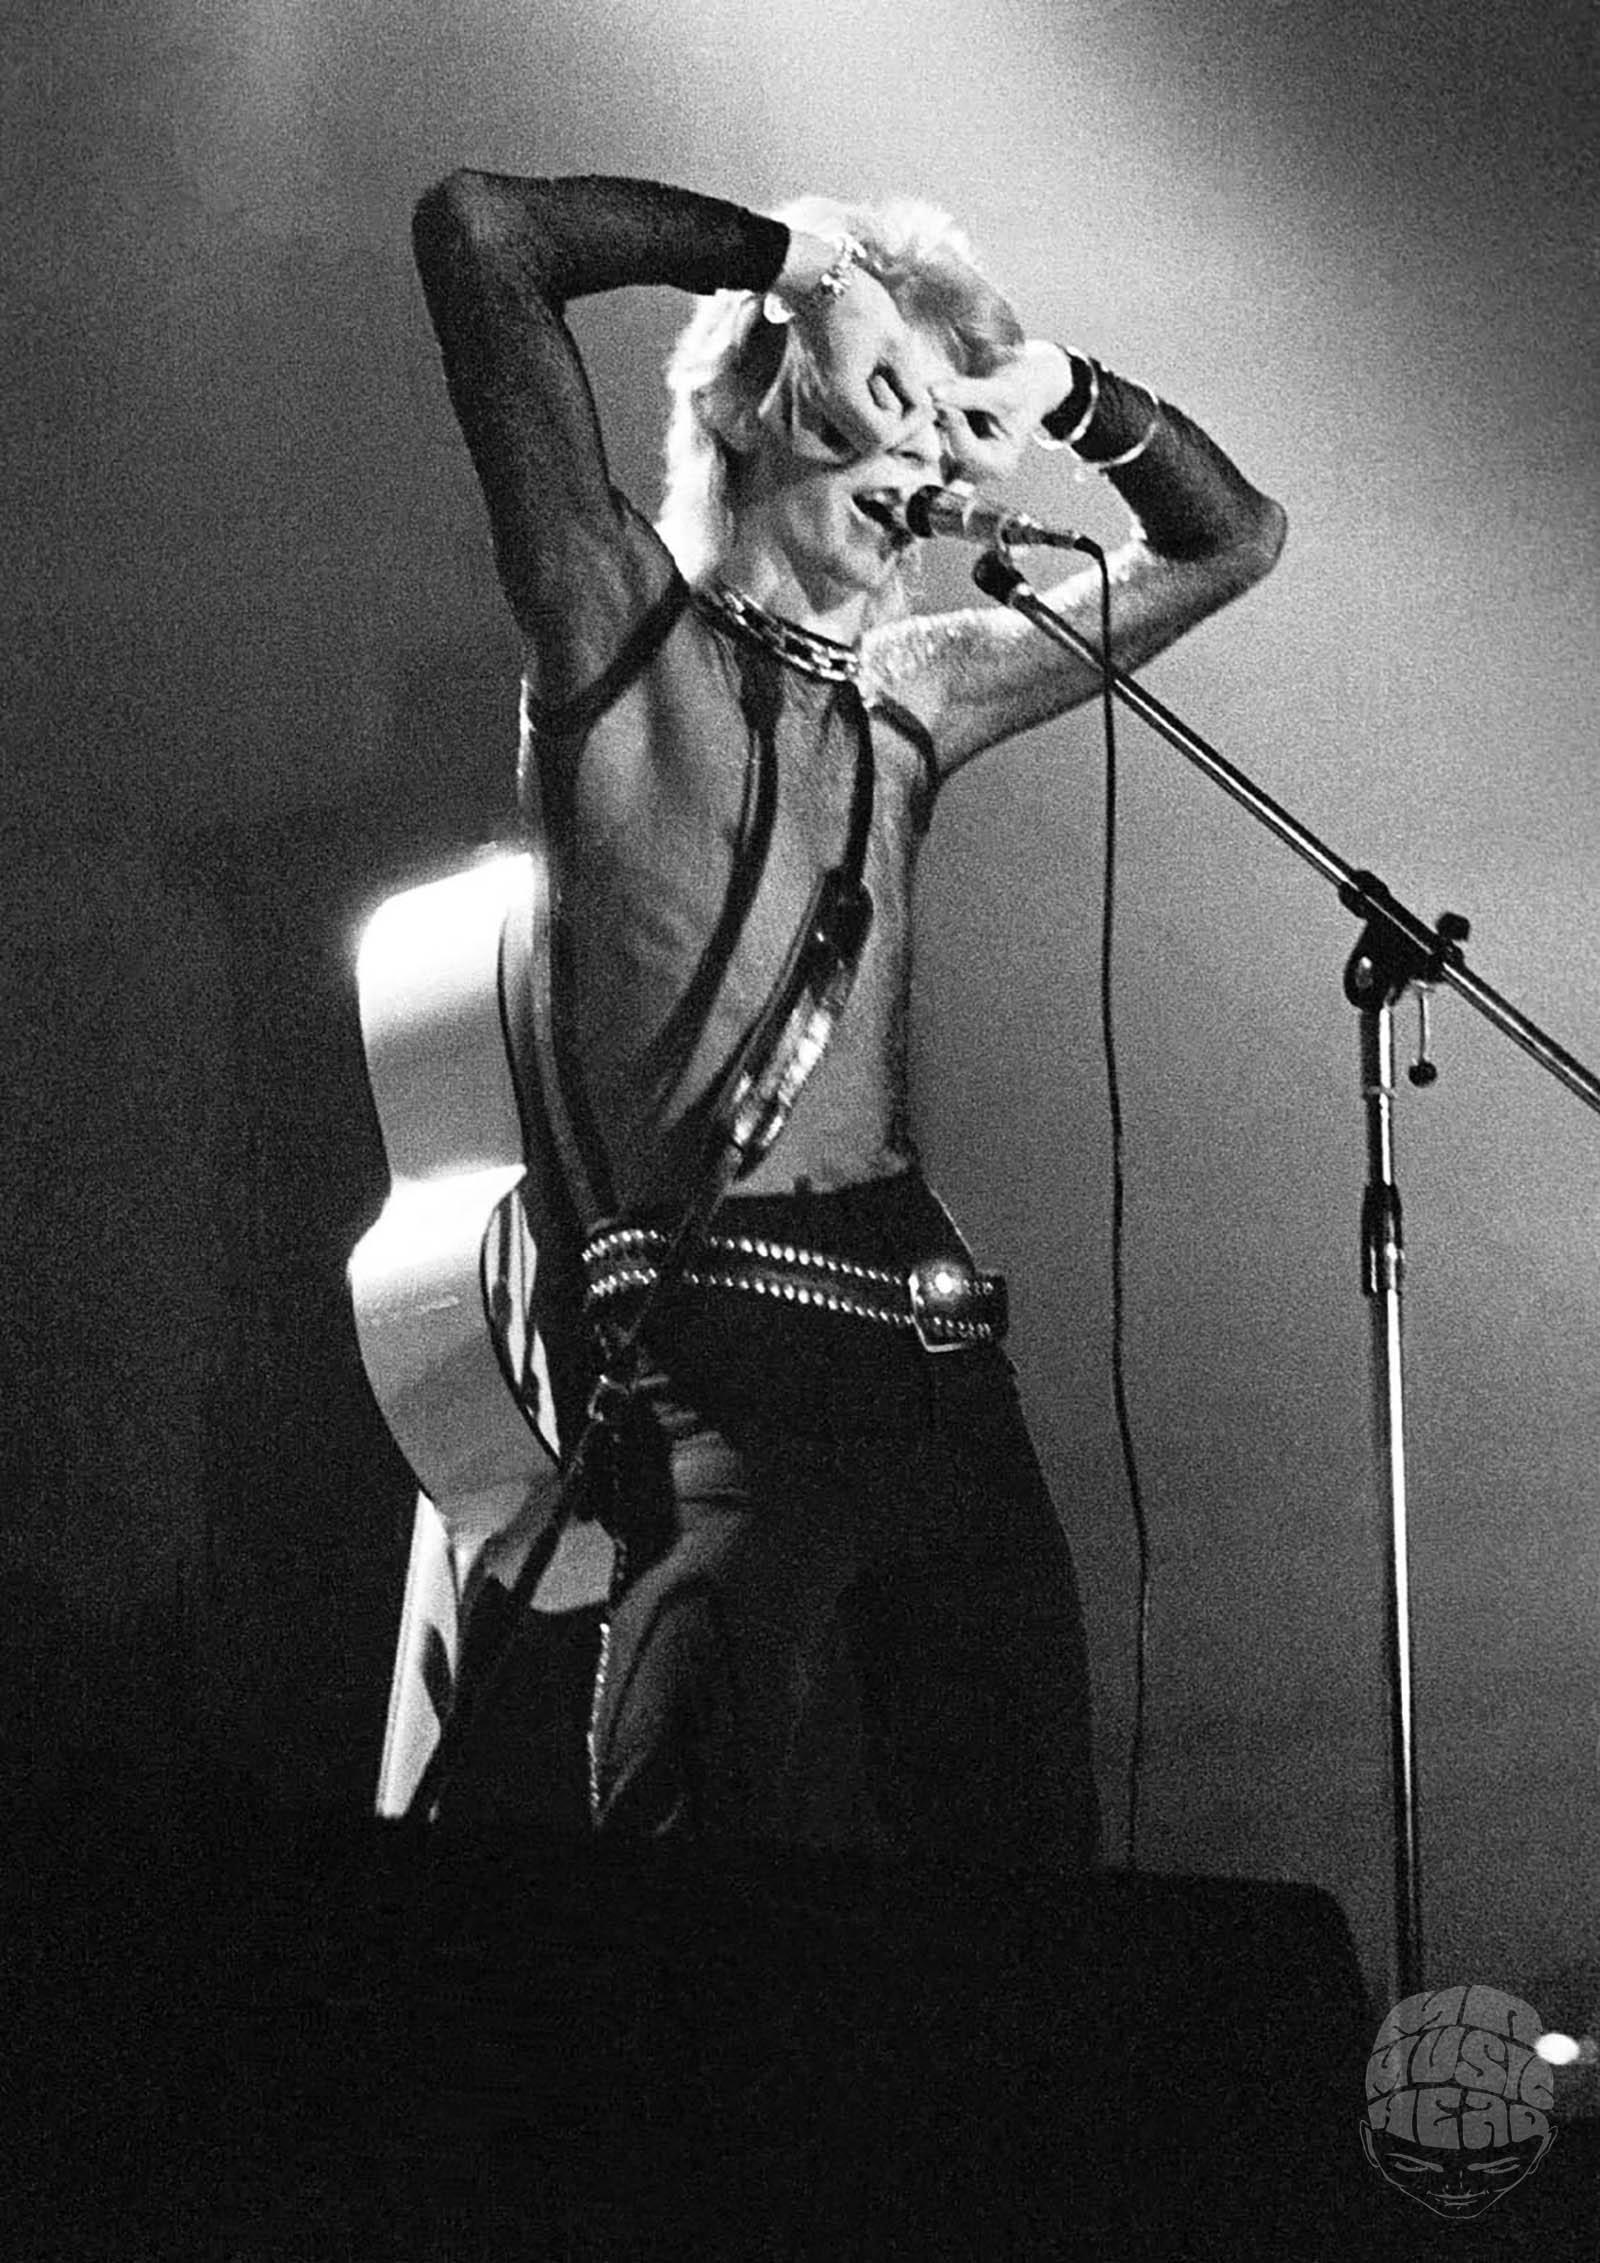 ian dickson_David Bowie 1973 live.jpg